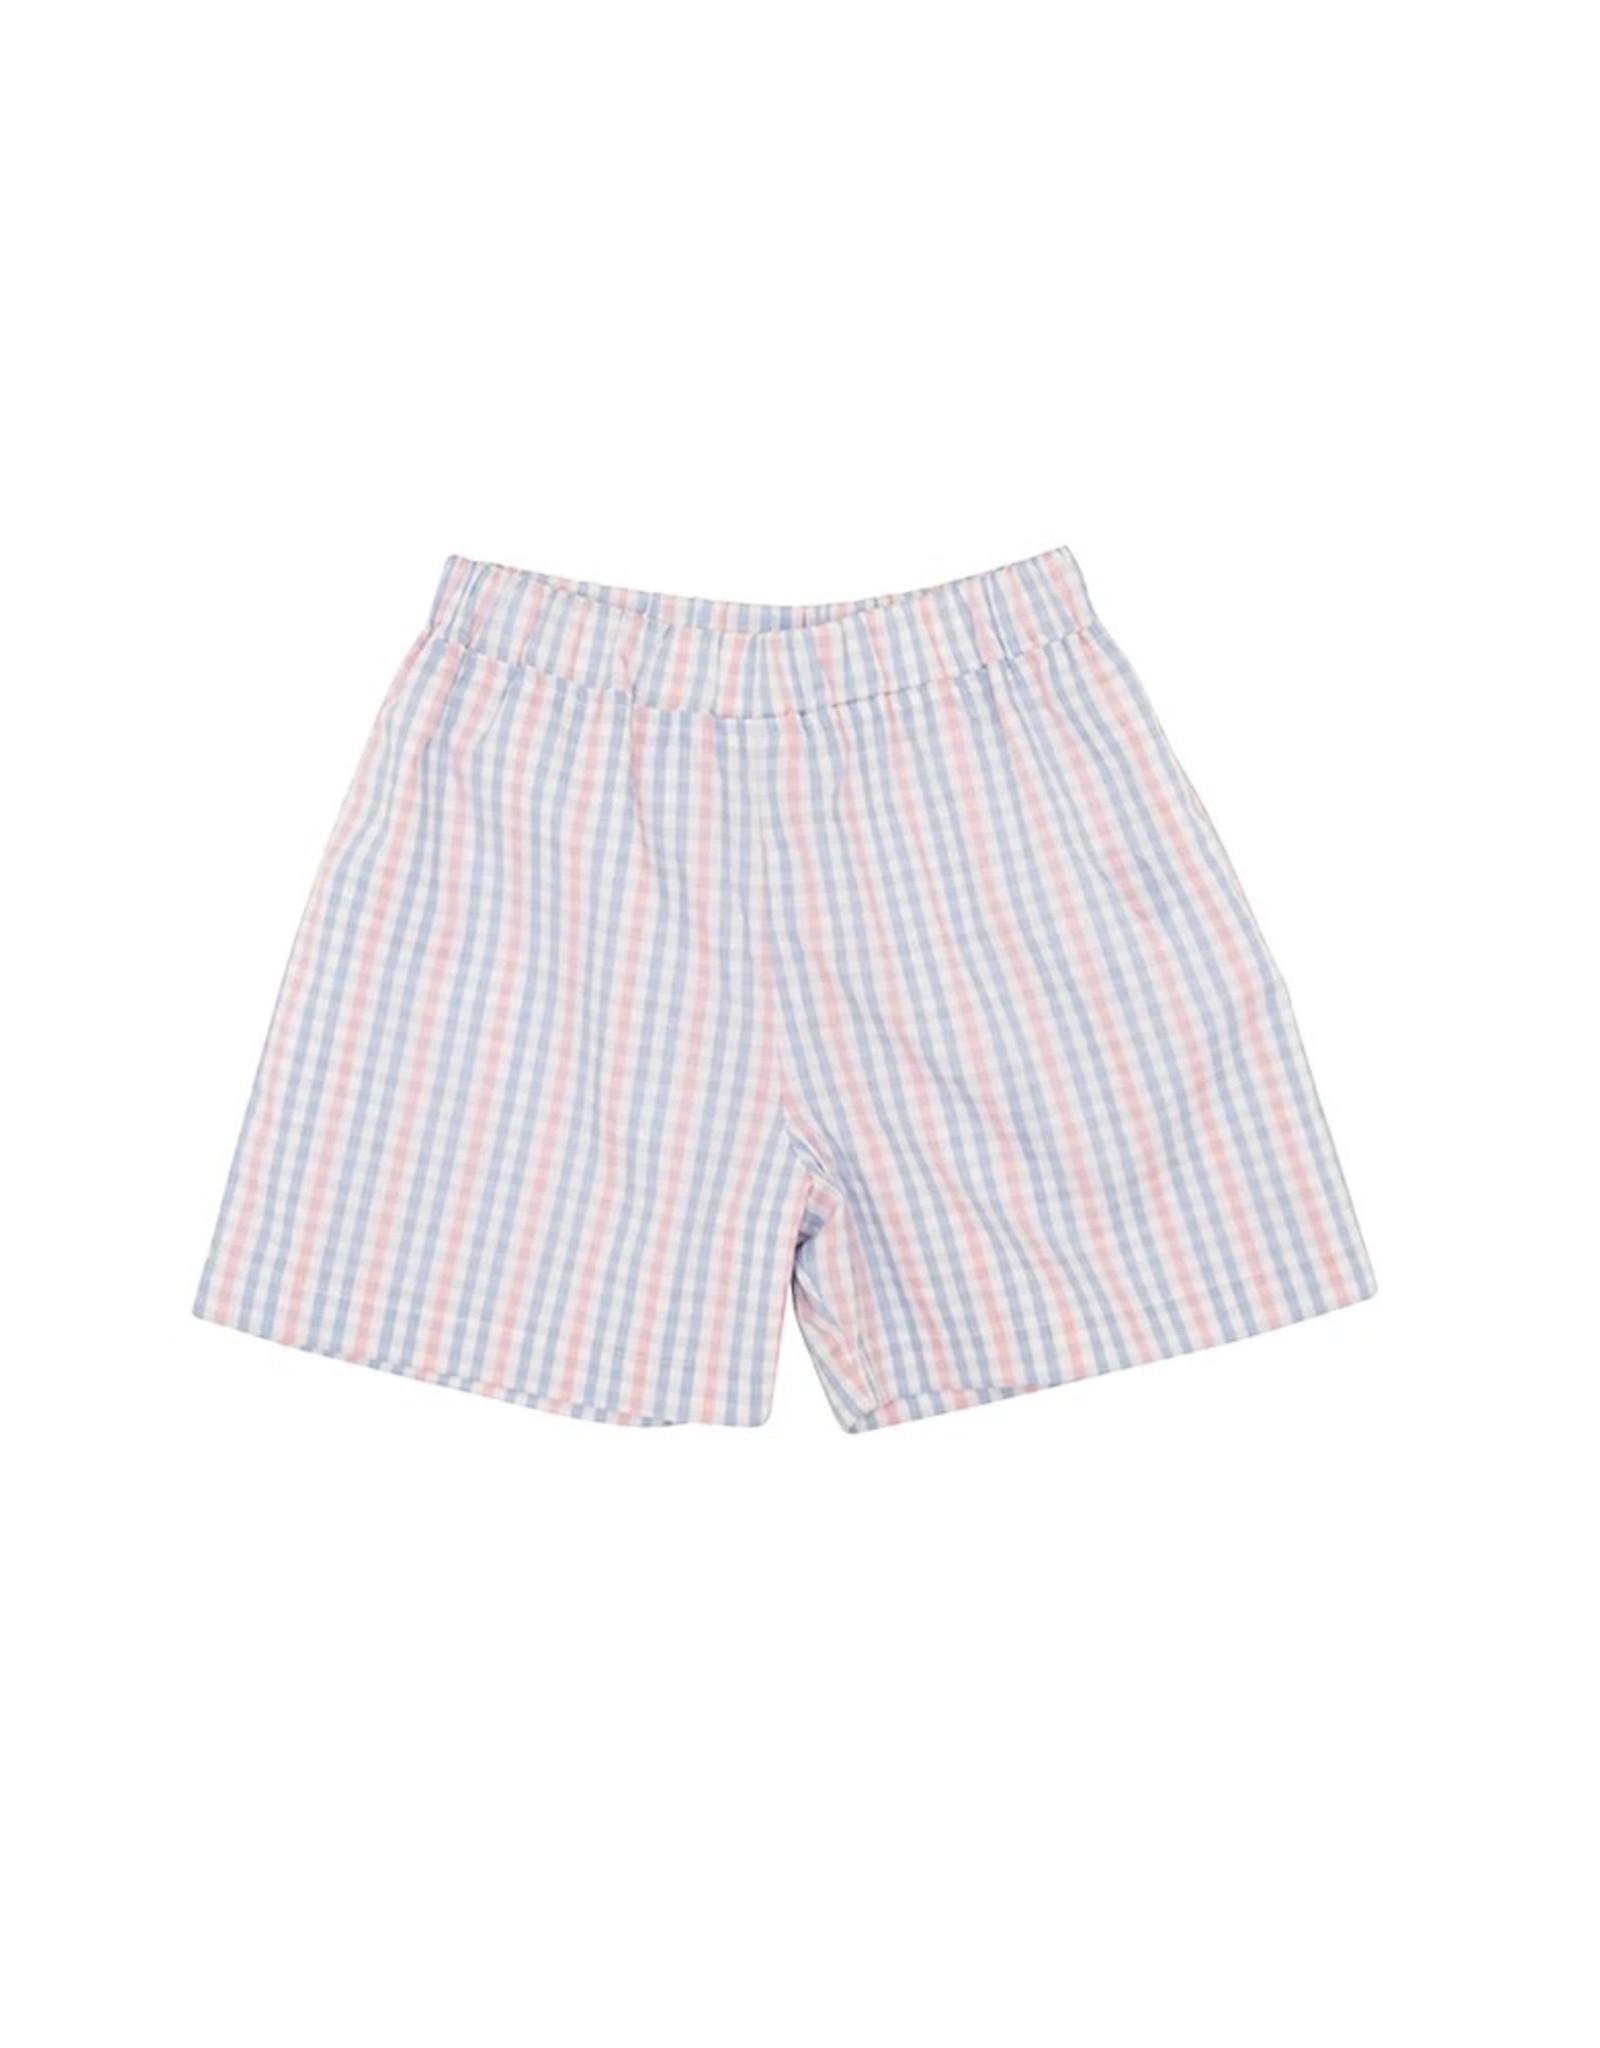 The Beaufort Bonnet Company Shelton Shorts